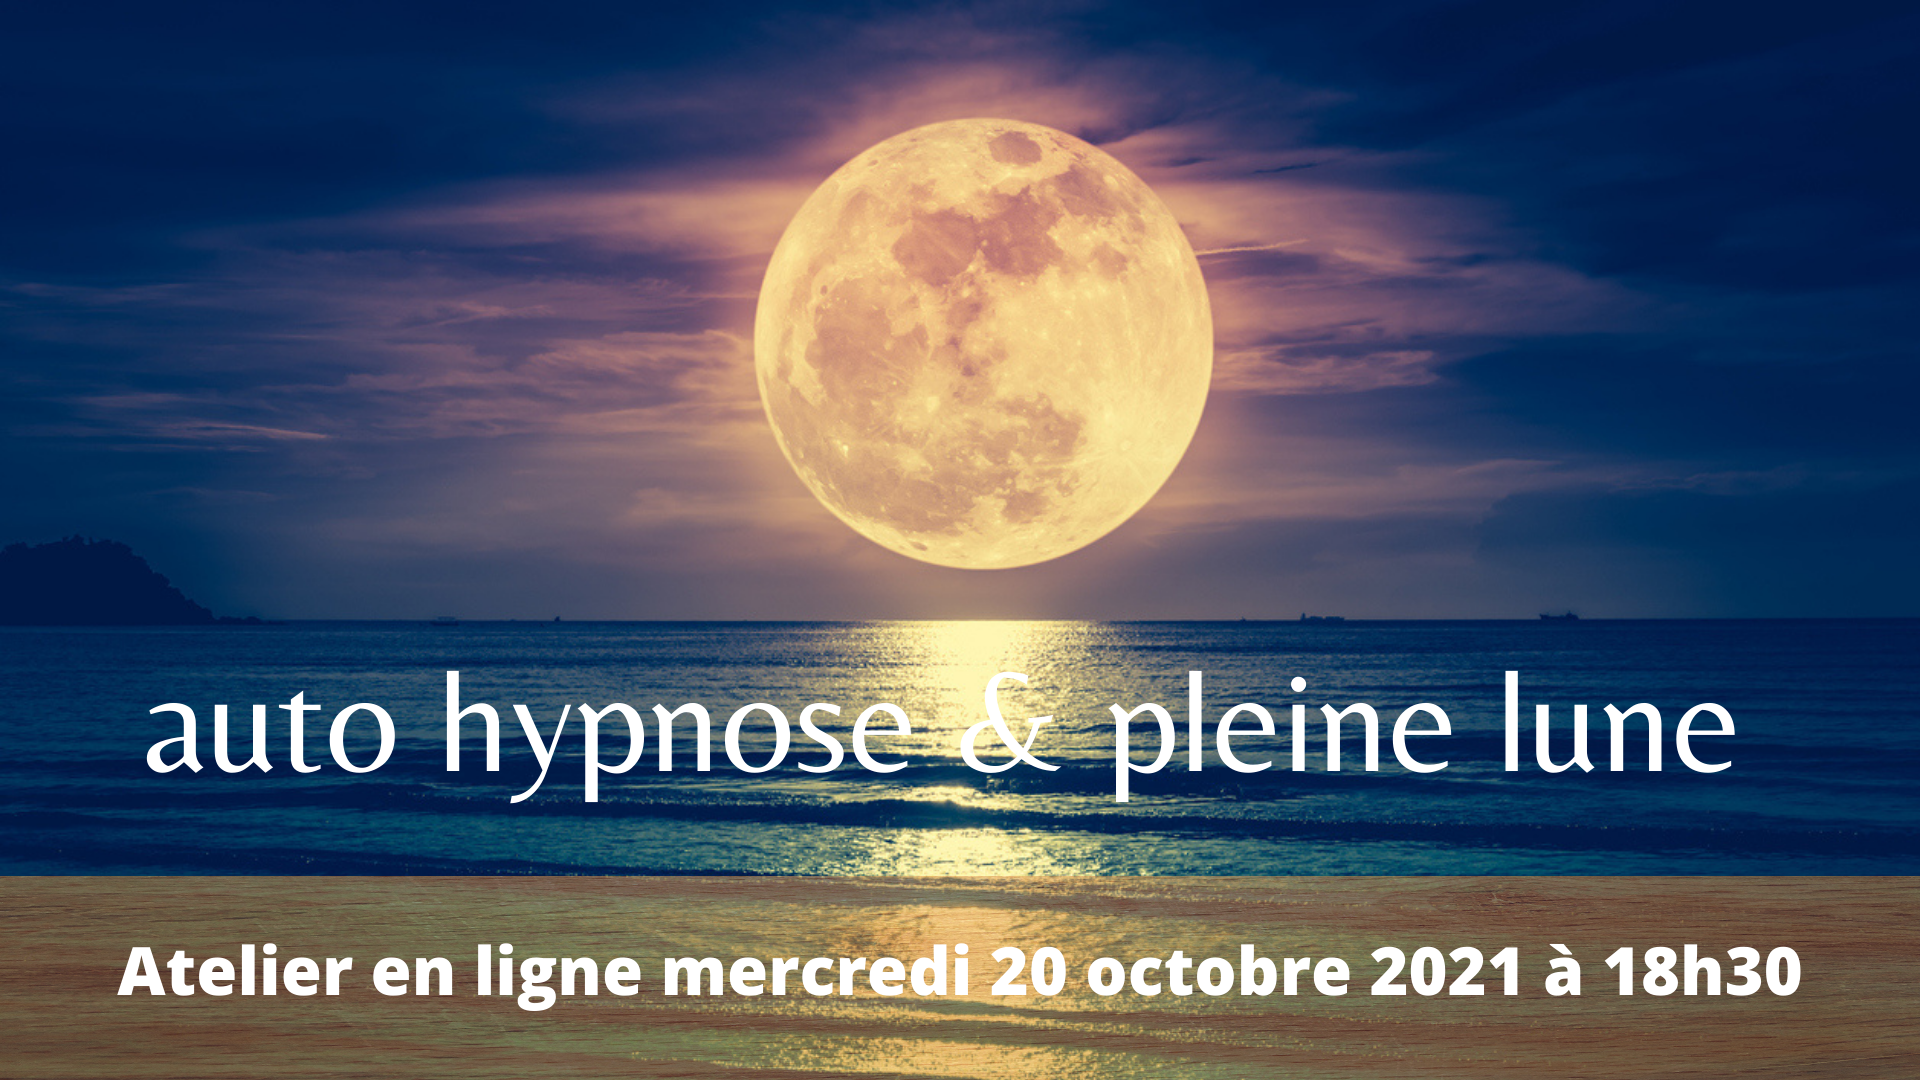 Atelier auto hypnose pleine lune